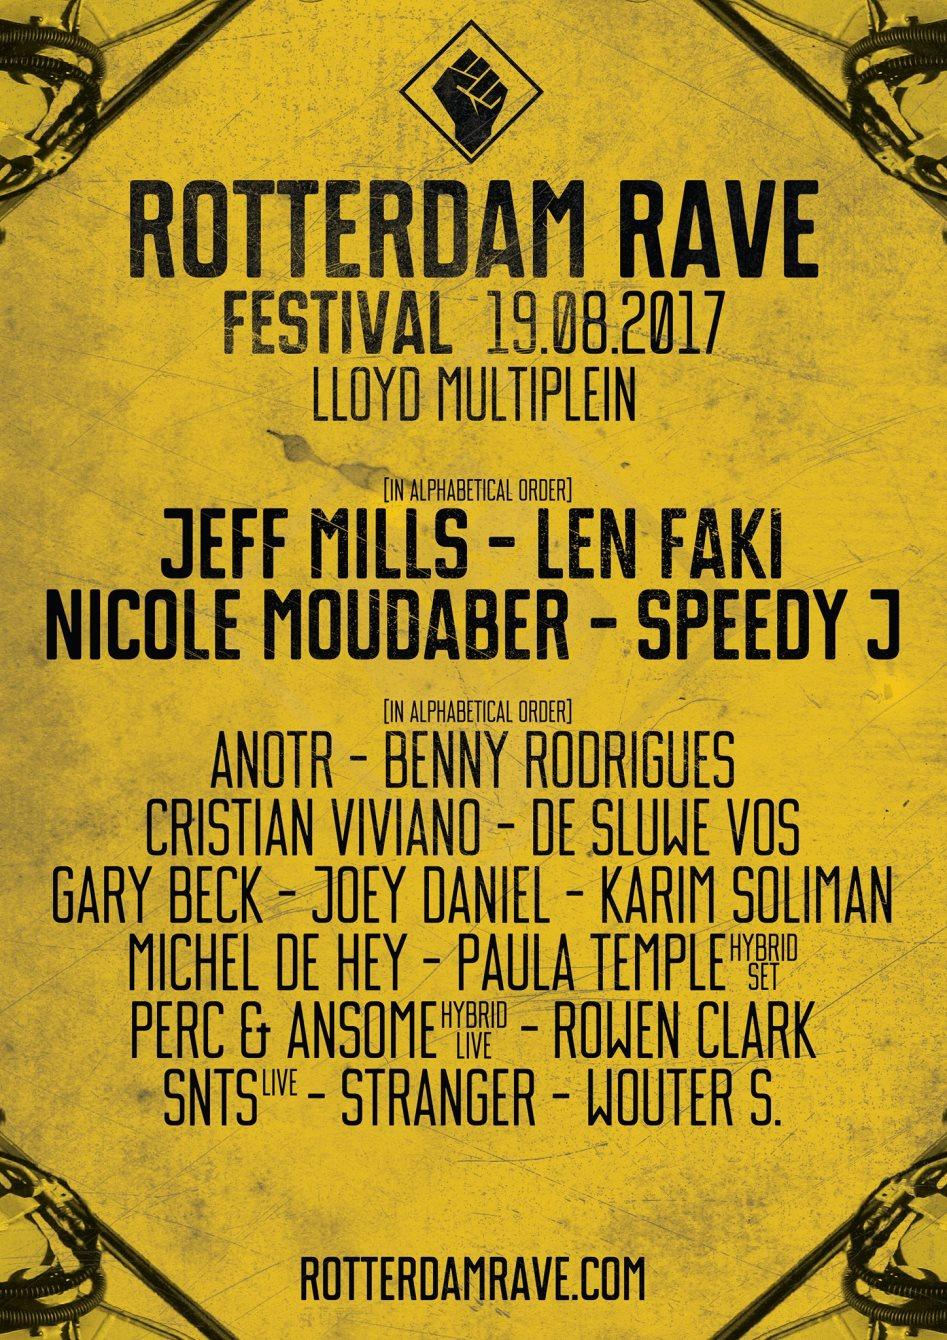 Rotterdam Rave Festival - Flyer front